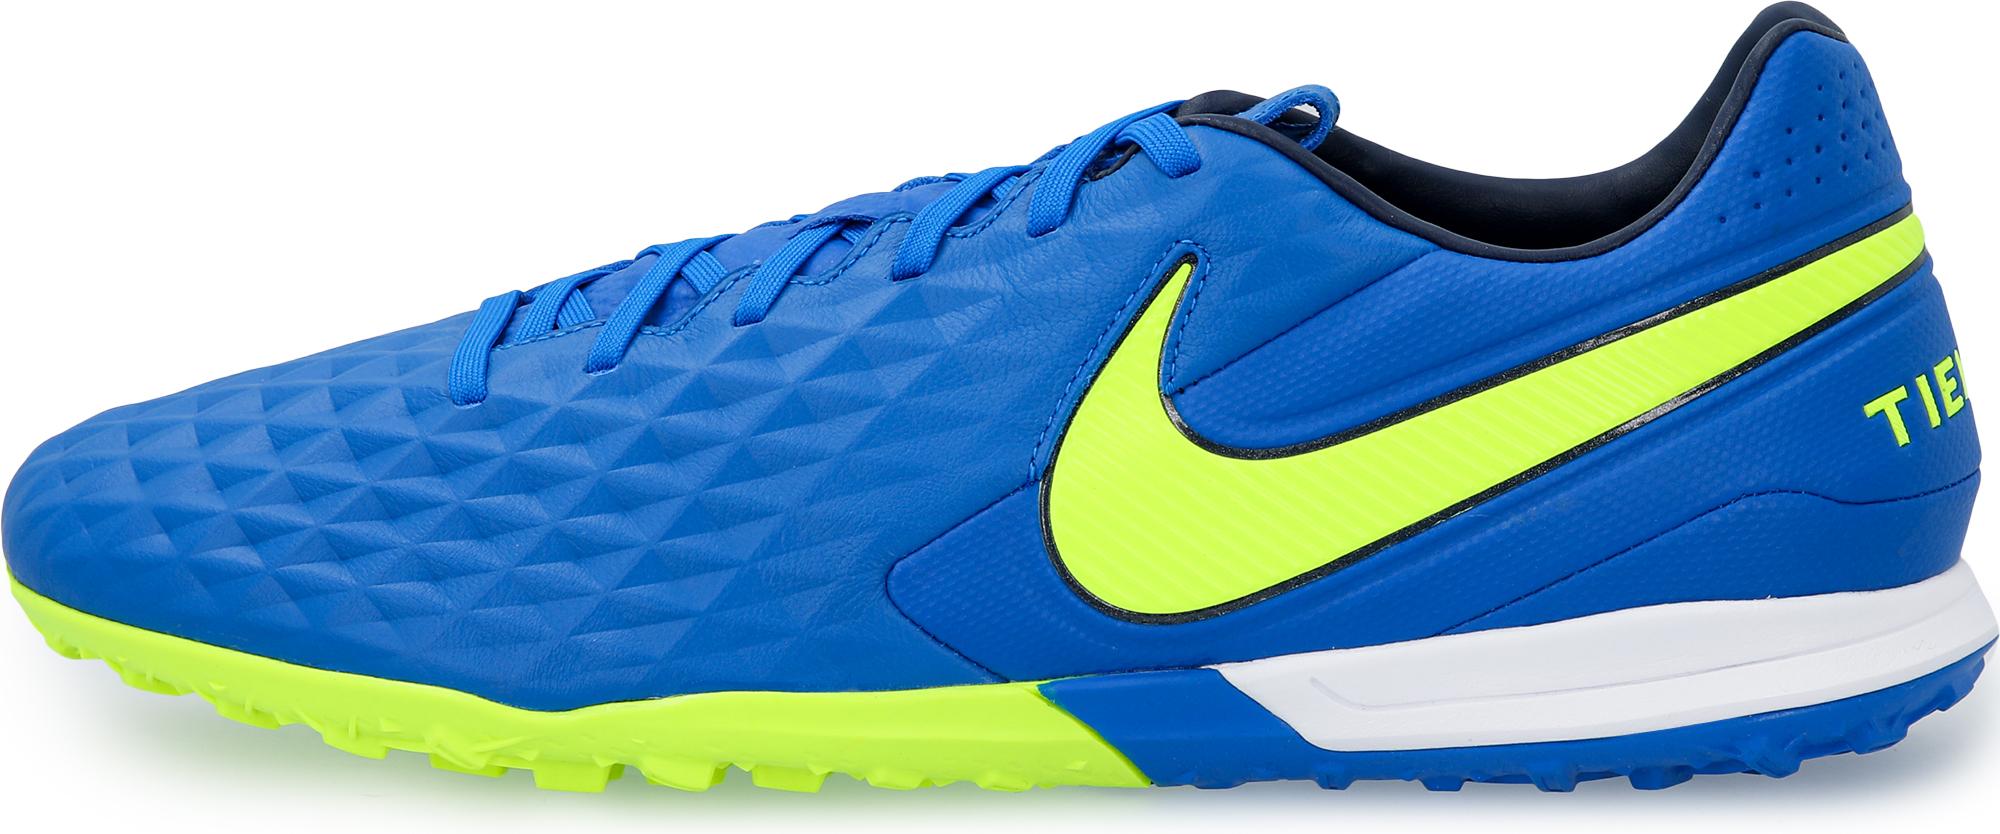 Nike Бутсы мужские Nike Tiempo Legend 8 Pro TF, размер 40 цена 2017